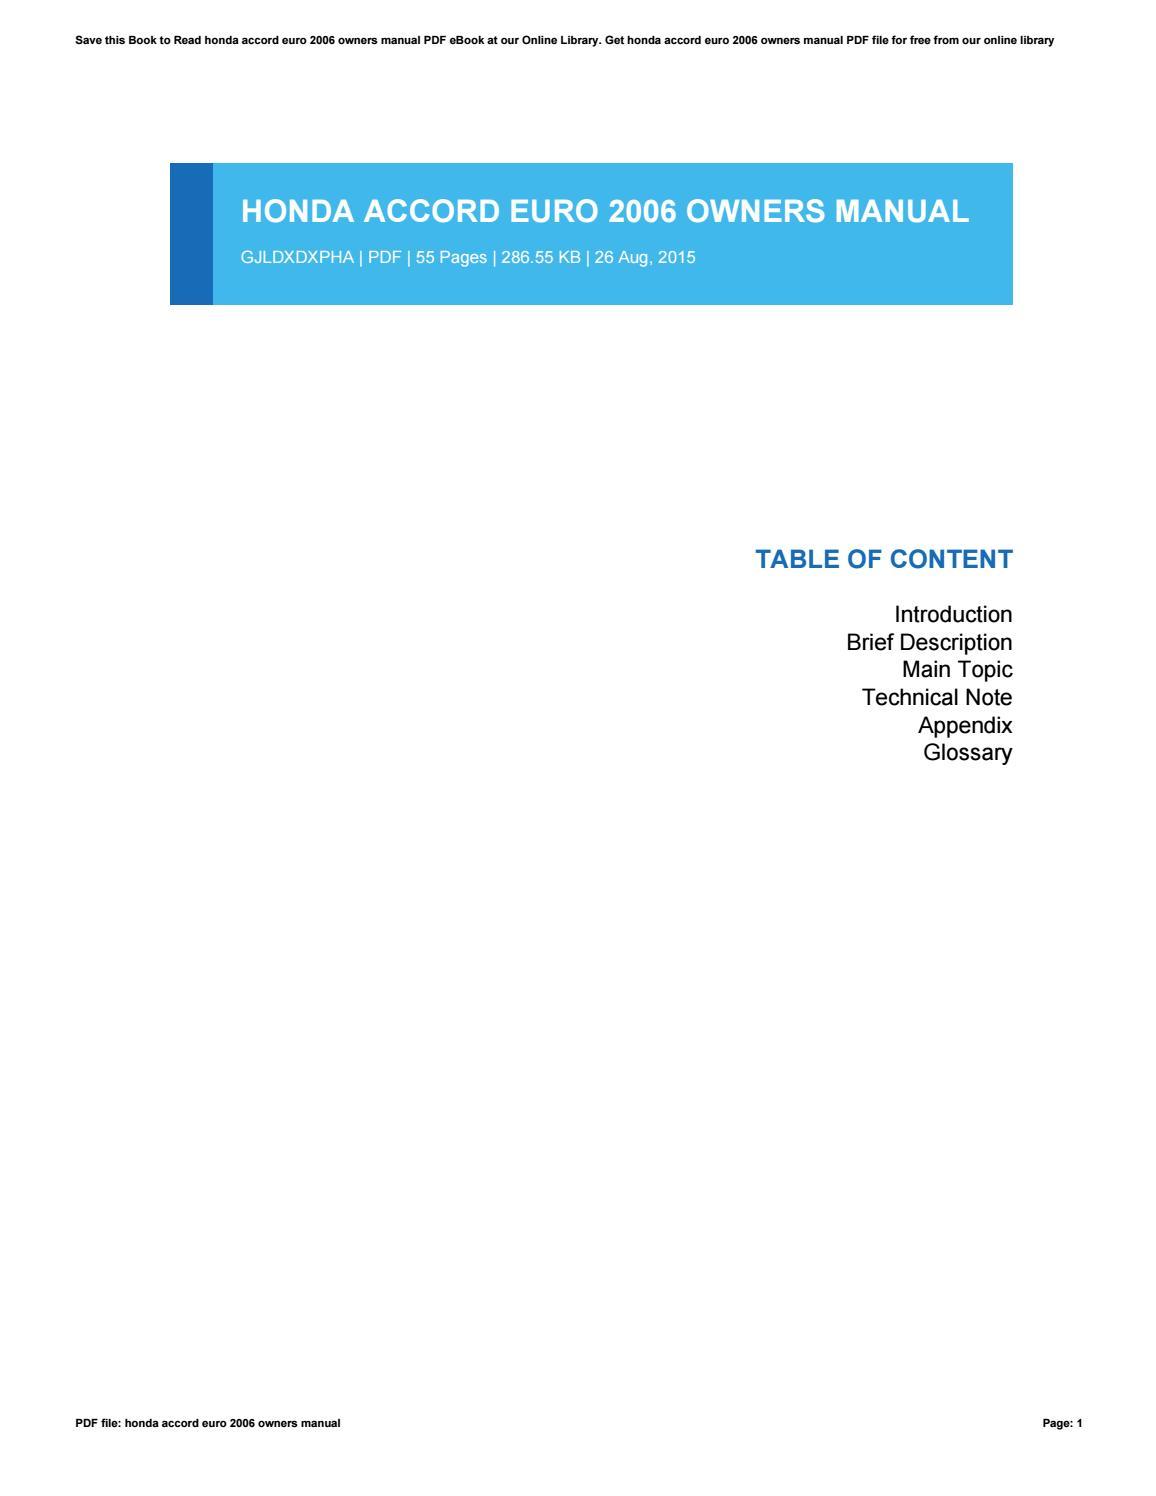 honda accord euro 2006 owners manual by elizabethwillis4984 issuu rh issuu  com 1996 honda accord owners manual online 2013 Honda Accord Owners Manual